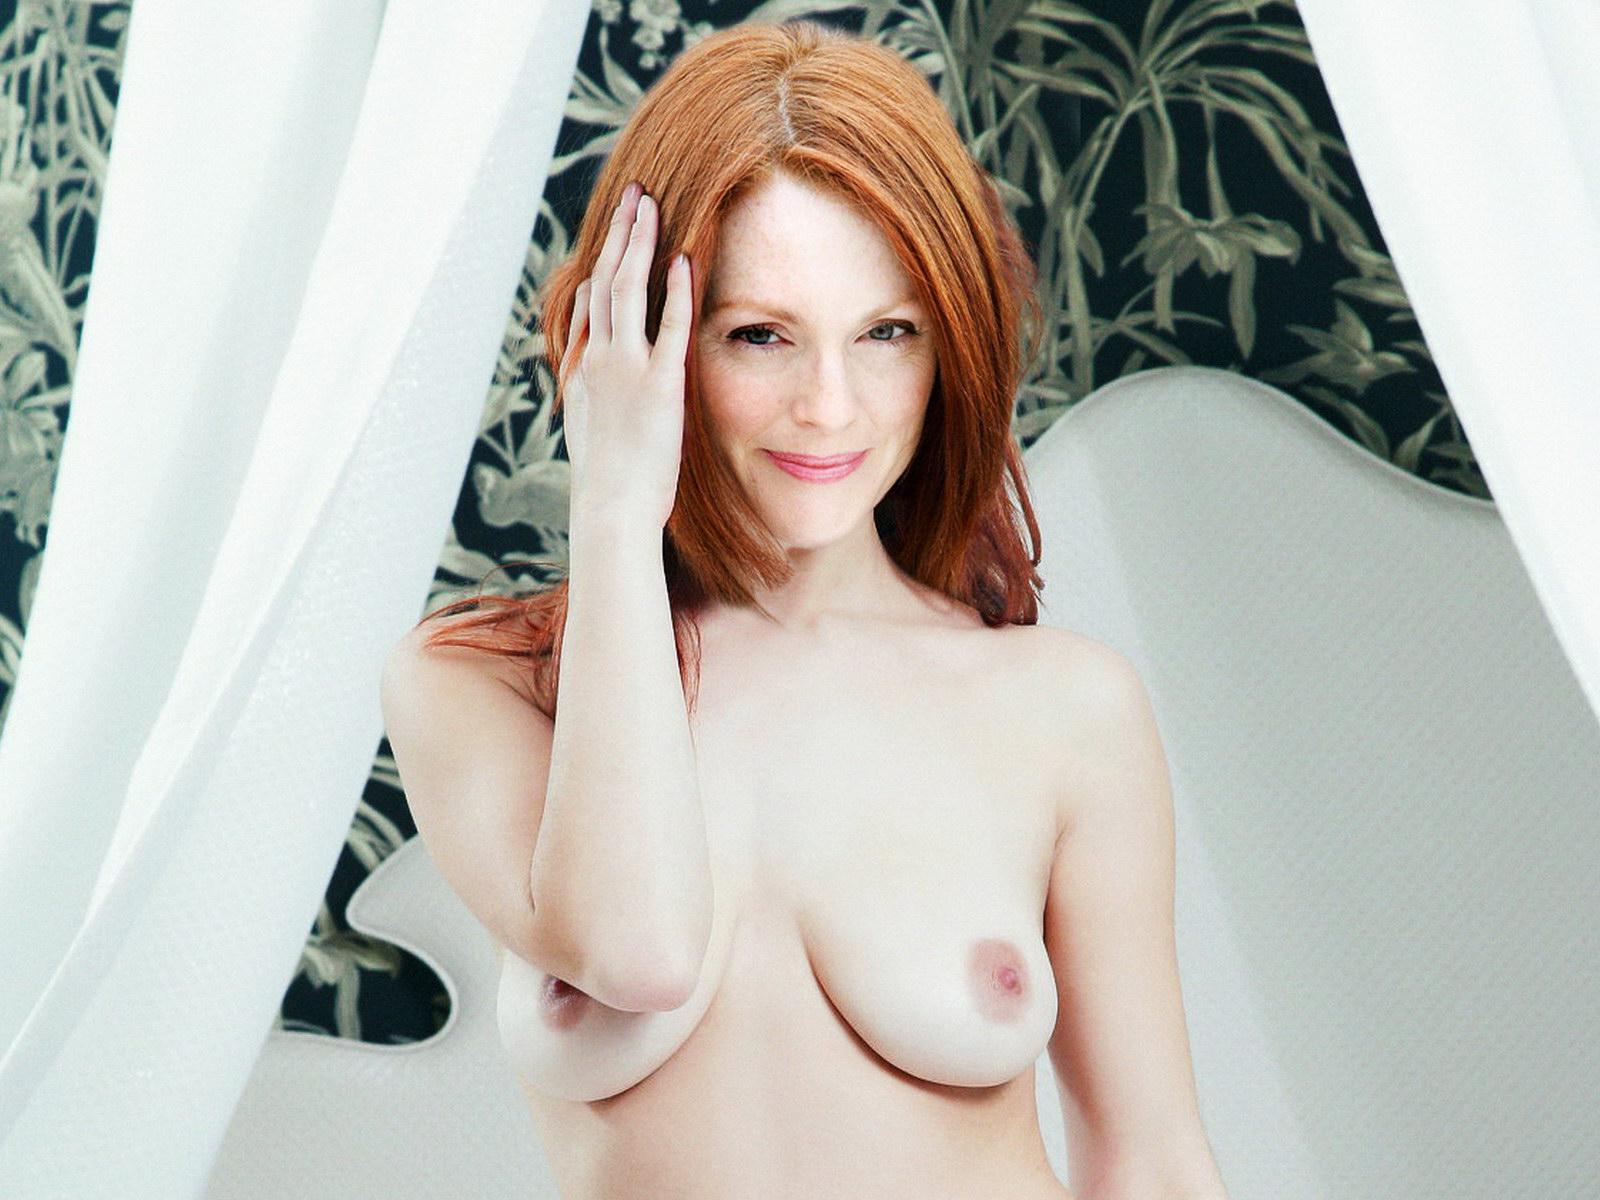 http://3.bp.blogspot.com/-4C8ij9tAA0Q/T4WCL47nq4I/AAAAAAAAASw/zcxQqk9Z4GA/s1600/Julianne+Moore+naked+on+her+bed+UHQ.jpg